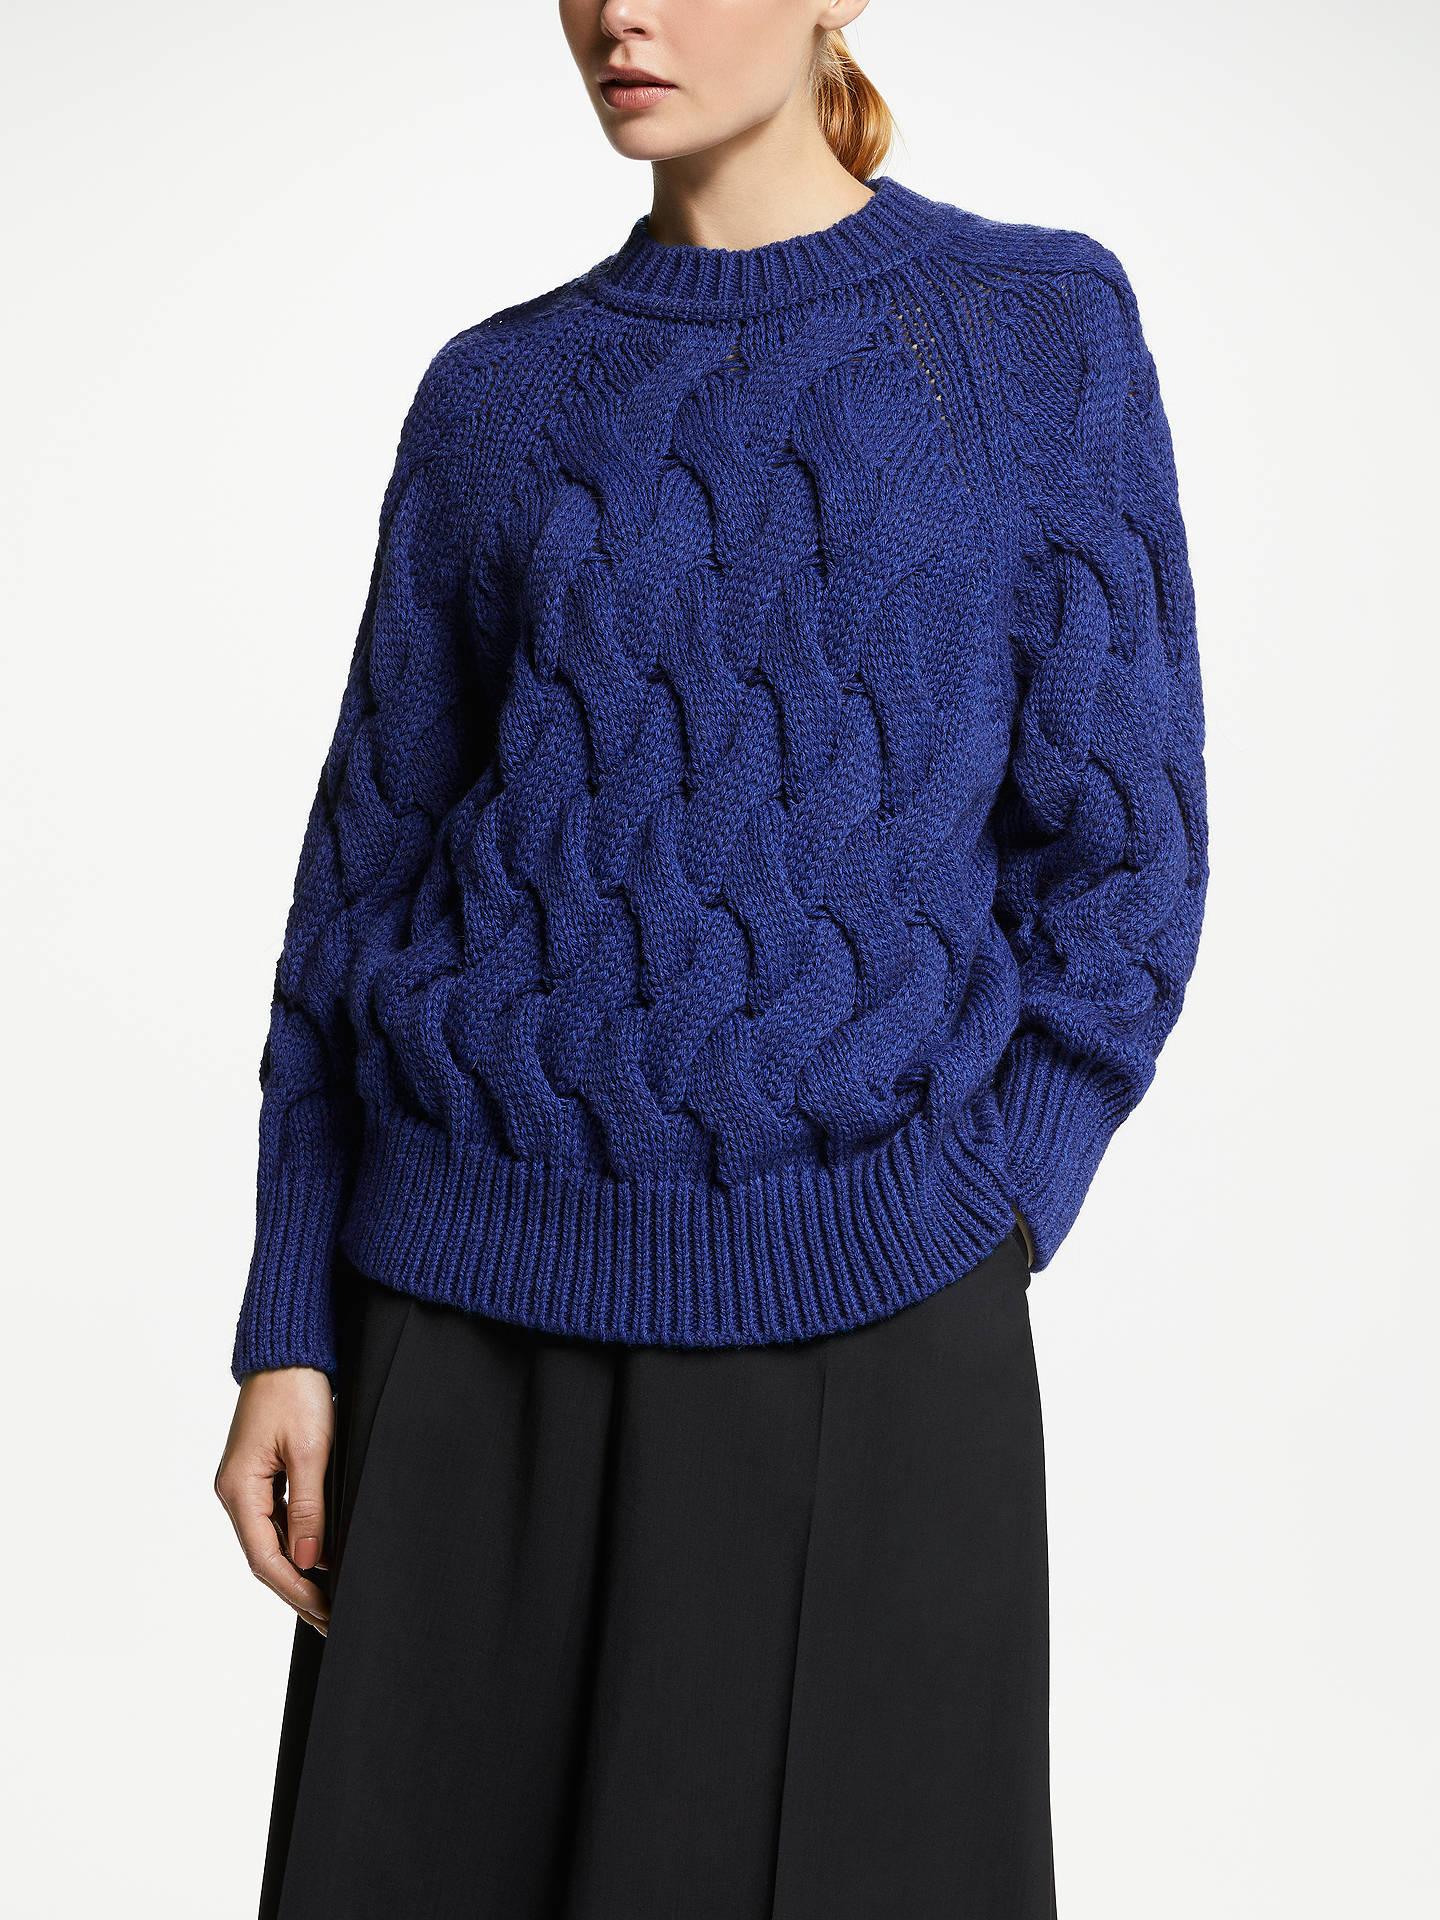 6d9cc8c3d9683 John Lewis   Partners Oversized Cable Knit Sweater at John Lewis ...